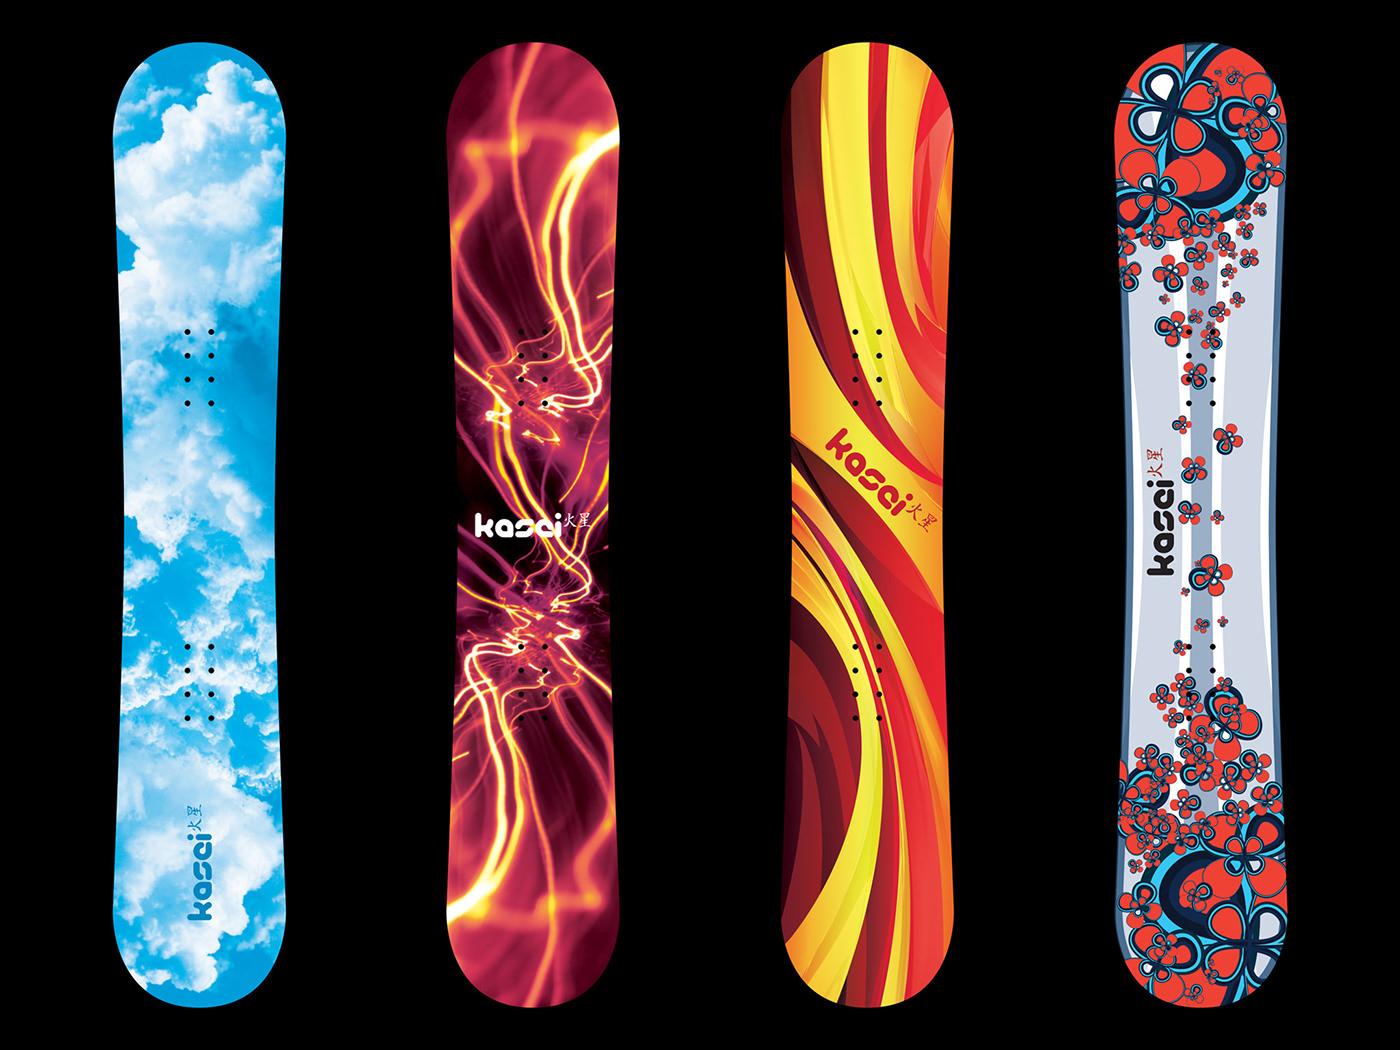 Snowboarding snowboard  graphics